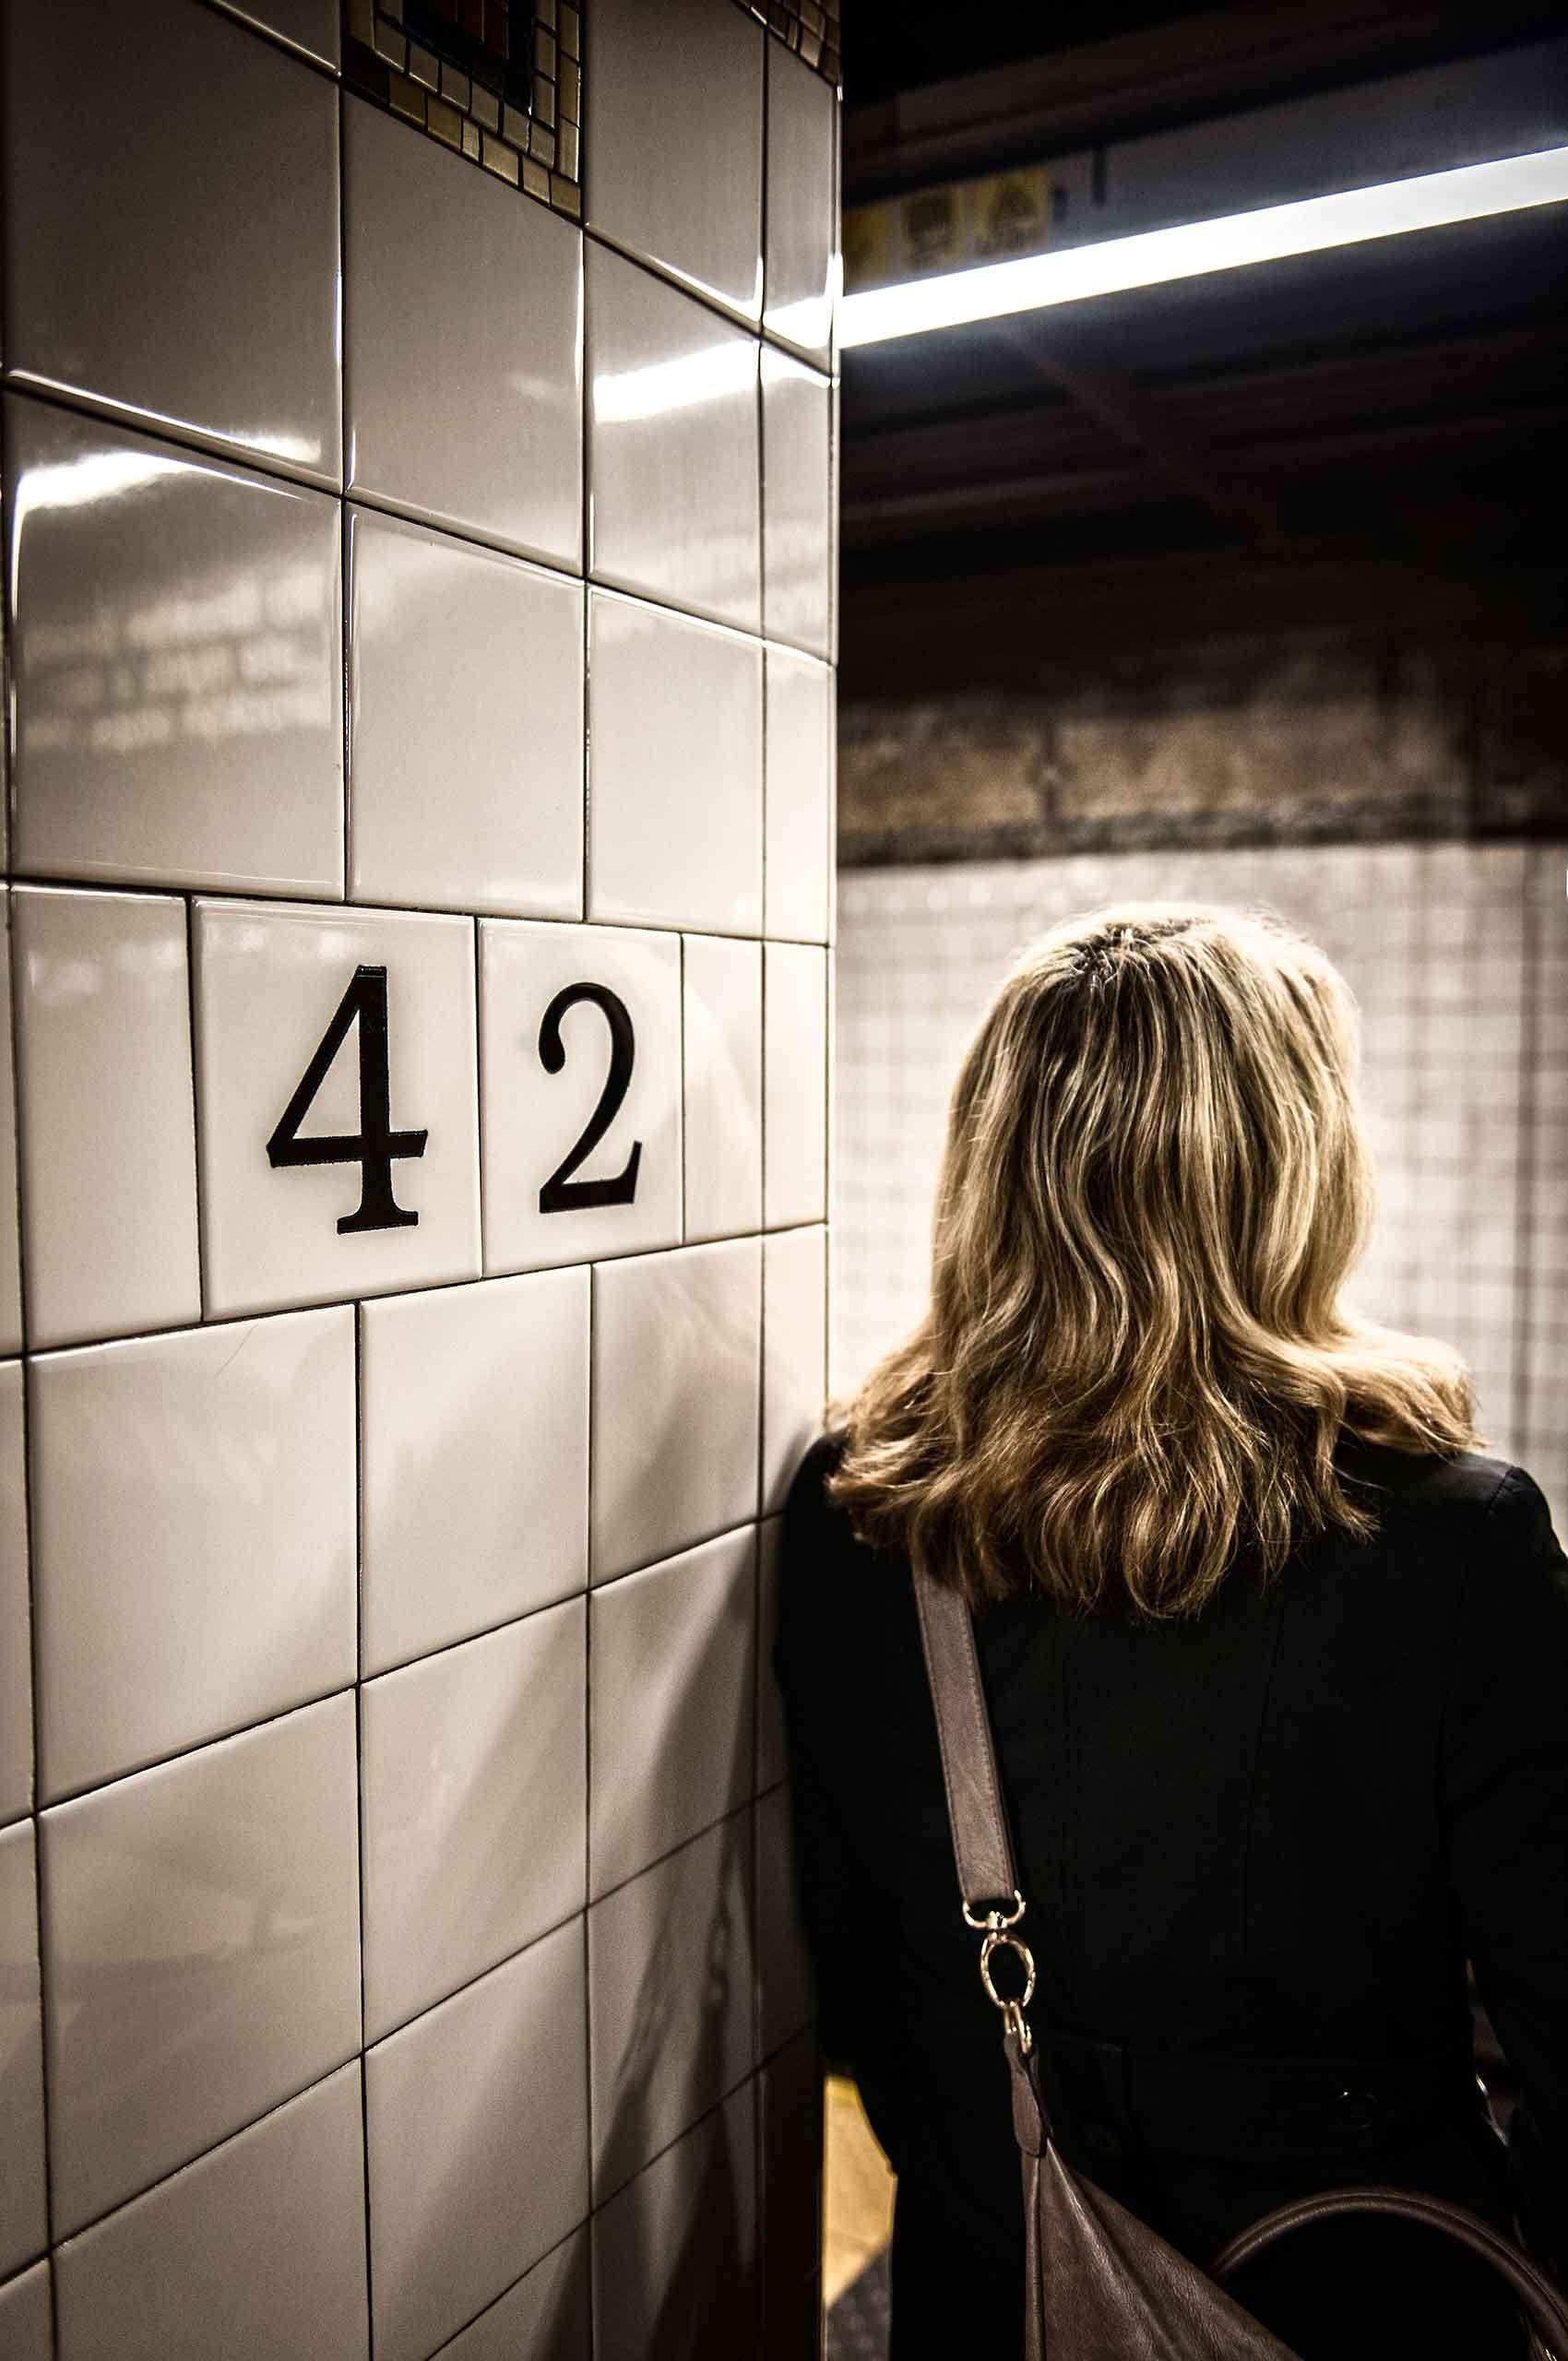 42ndstreetstation-subway-commuter-dirtyblondwoman-by-HenrikOlundPhotography.jpg